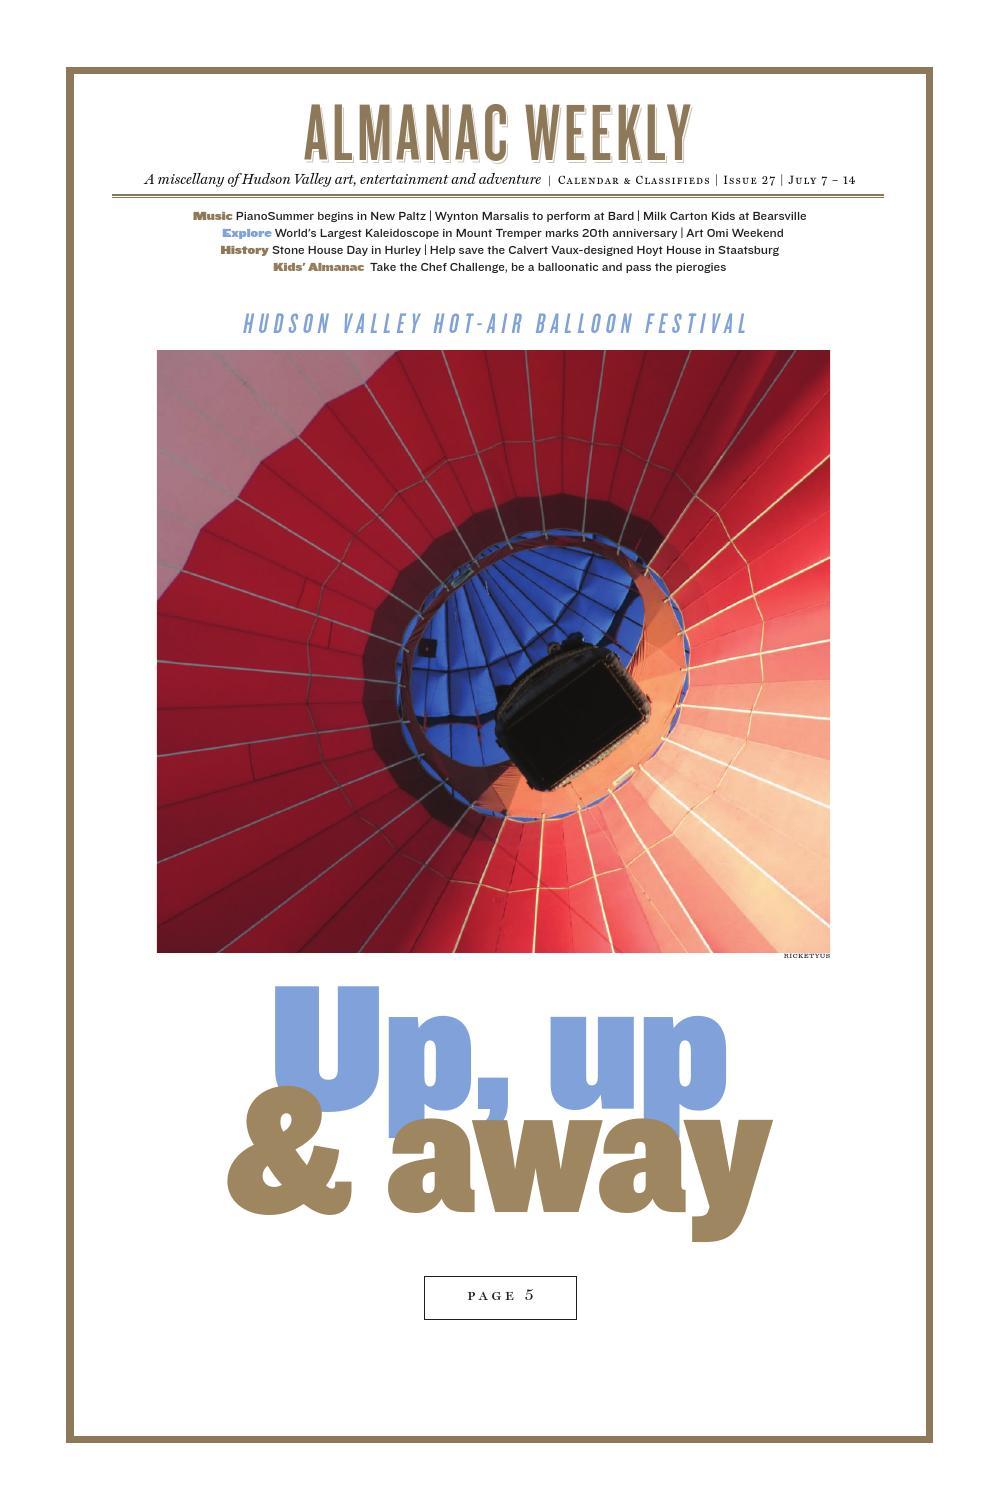 25 almanac composite esub by Ulster Publishing   issuu